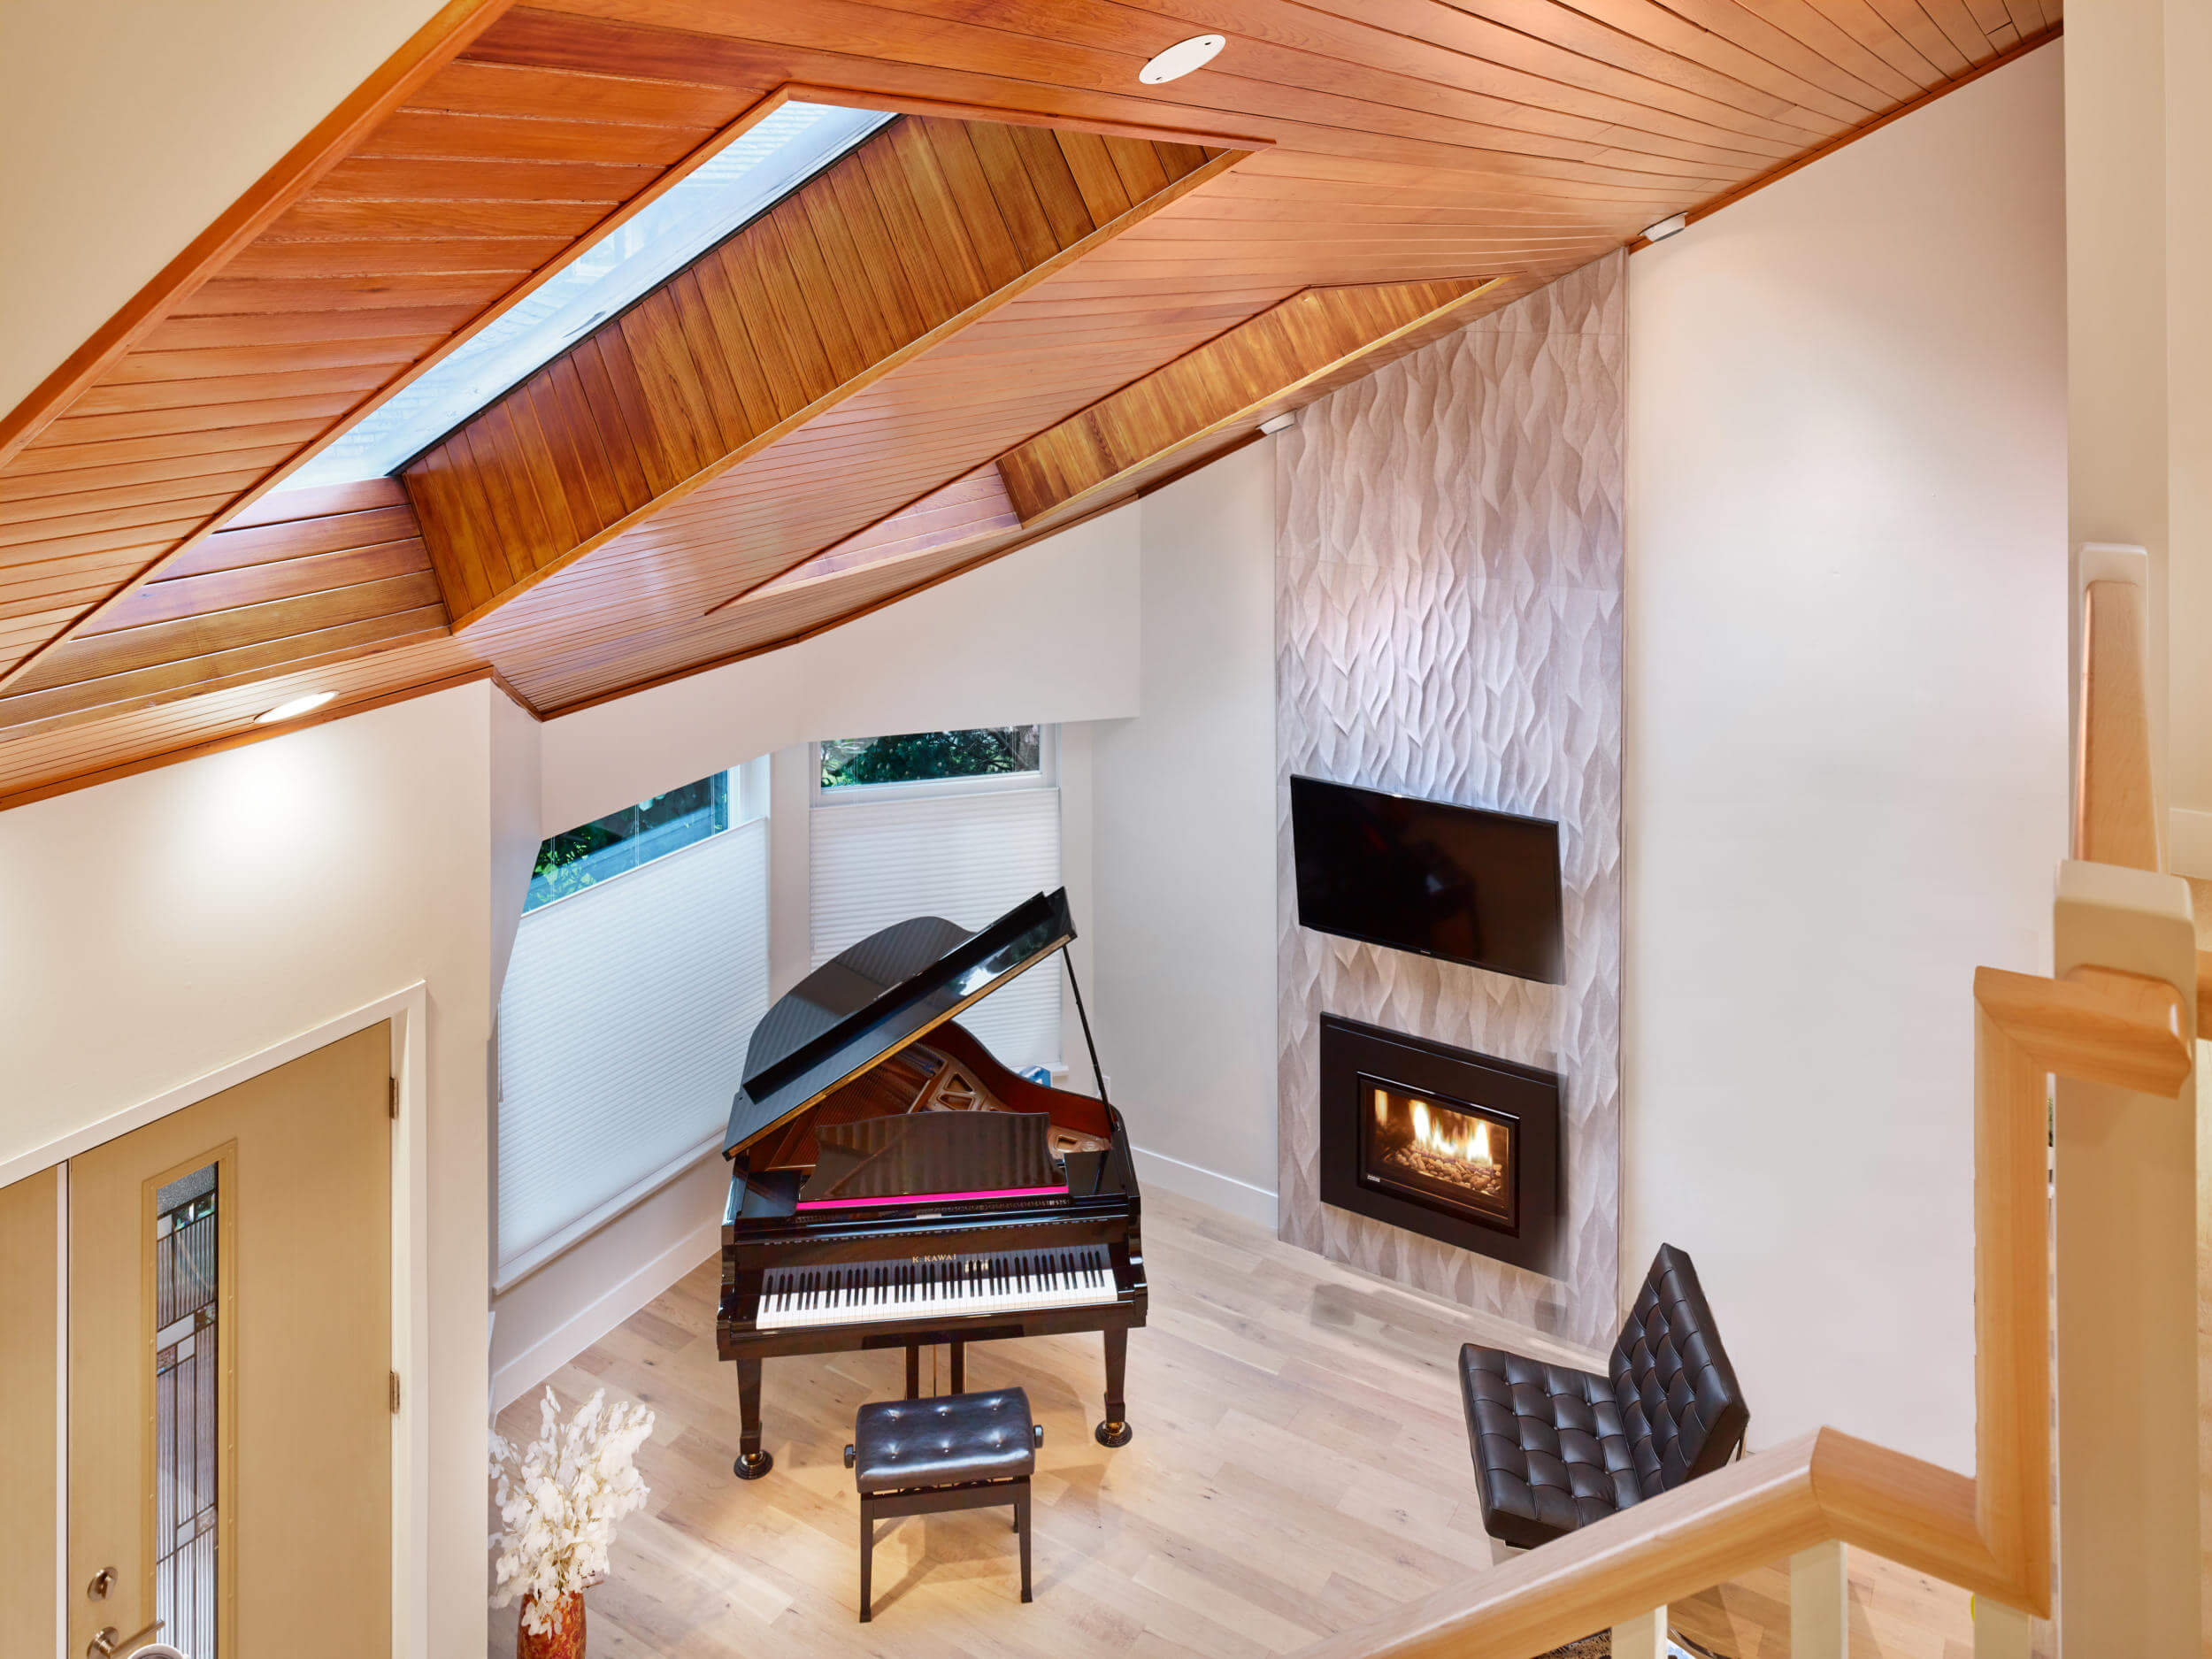 cheap tips ideas expensive design like ghk interior bucks decorating decor million ways home look make